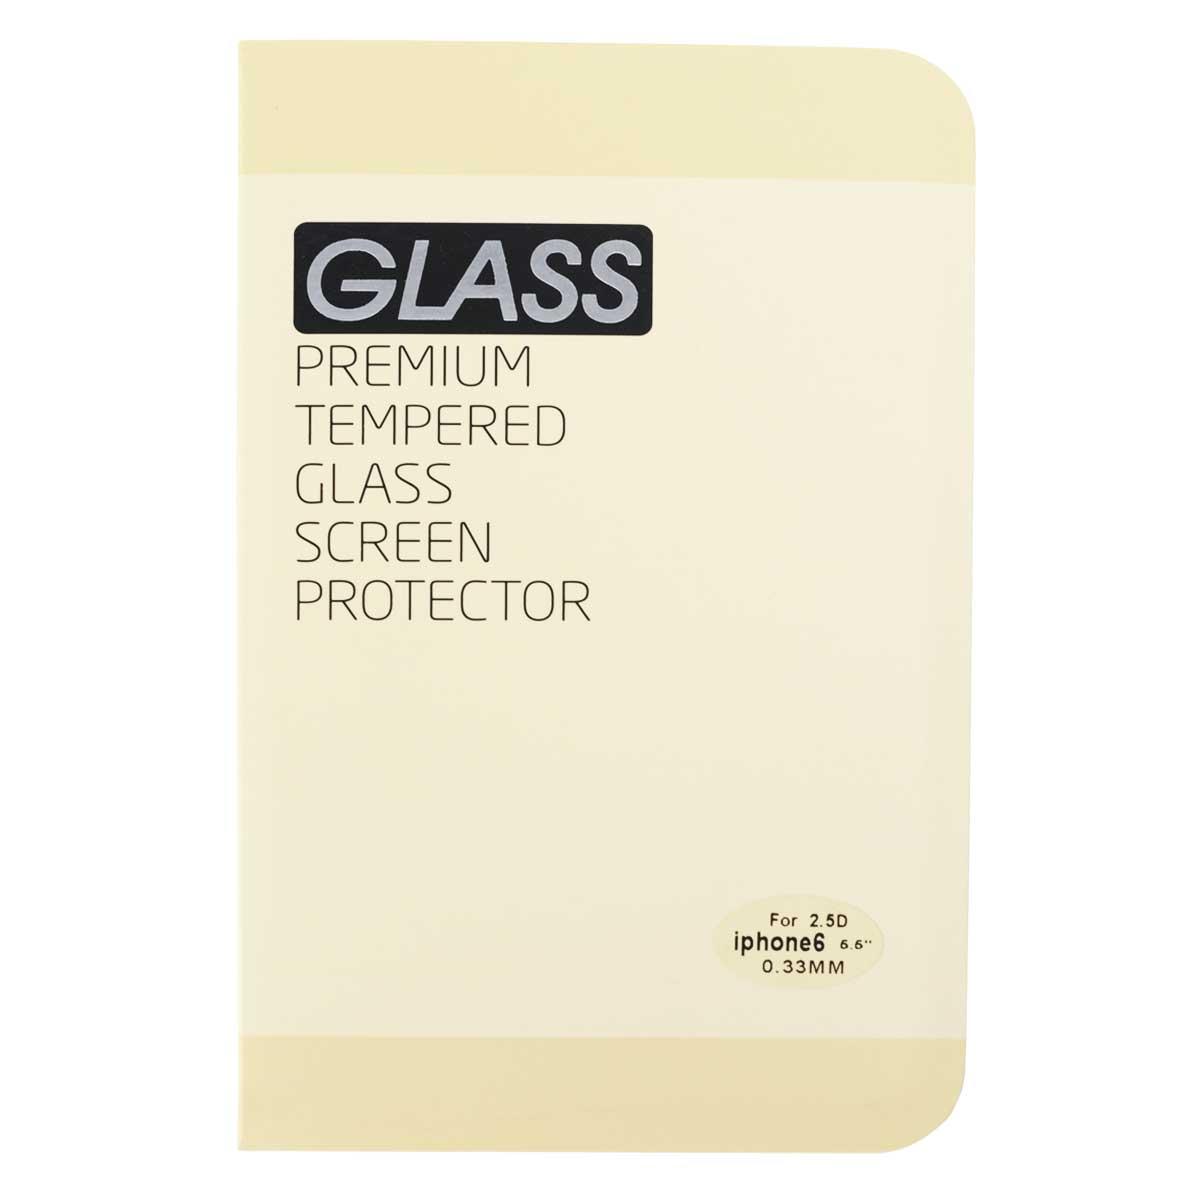 Liberty Project Tempered Glass защитное стекло для iPhone 6 Plus, Clear (0,33 мм) mediagadget tempered glass для iphone 6